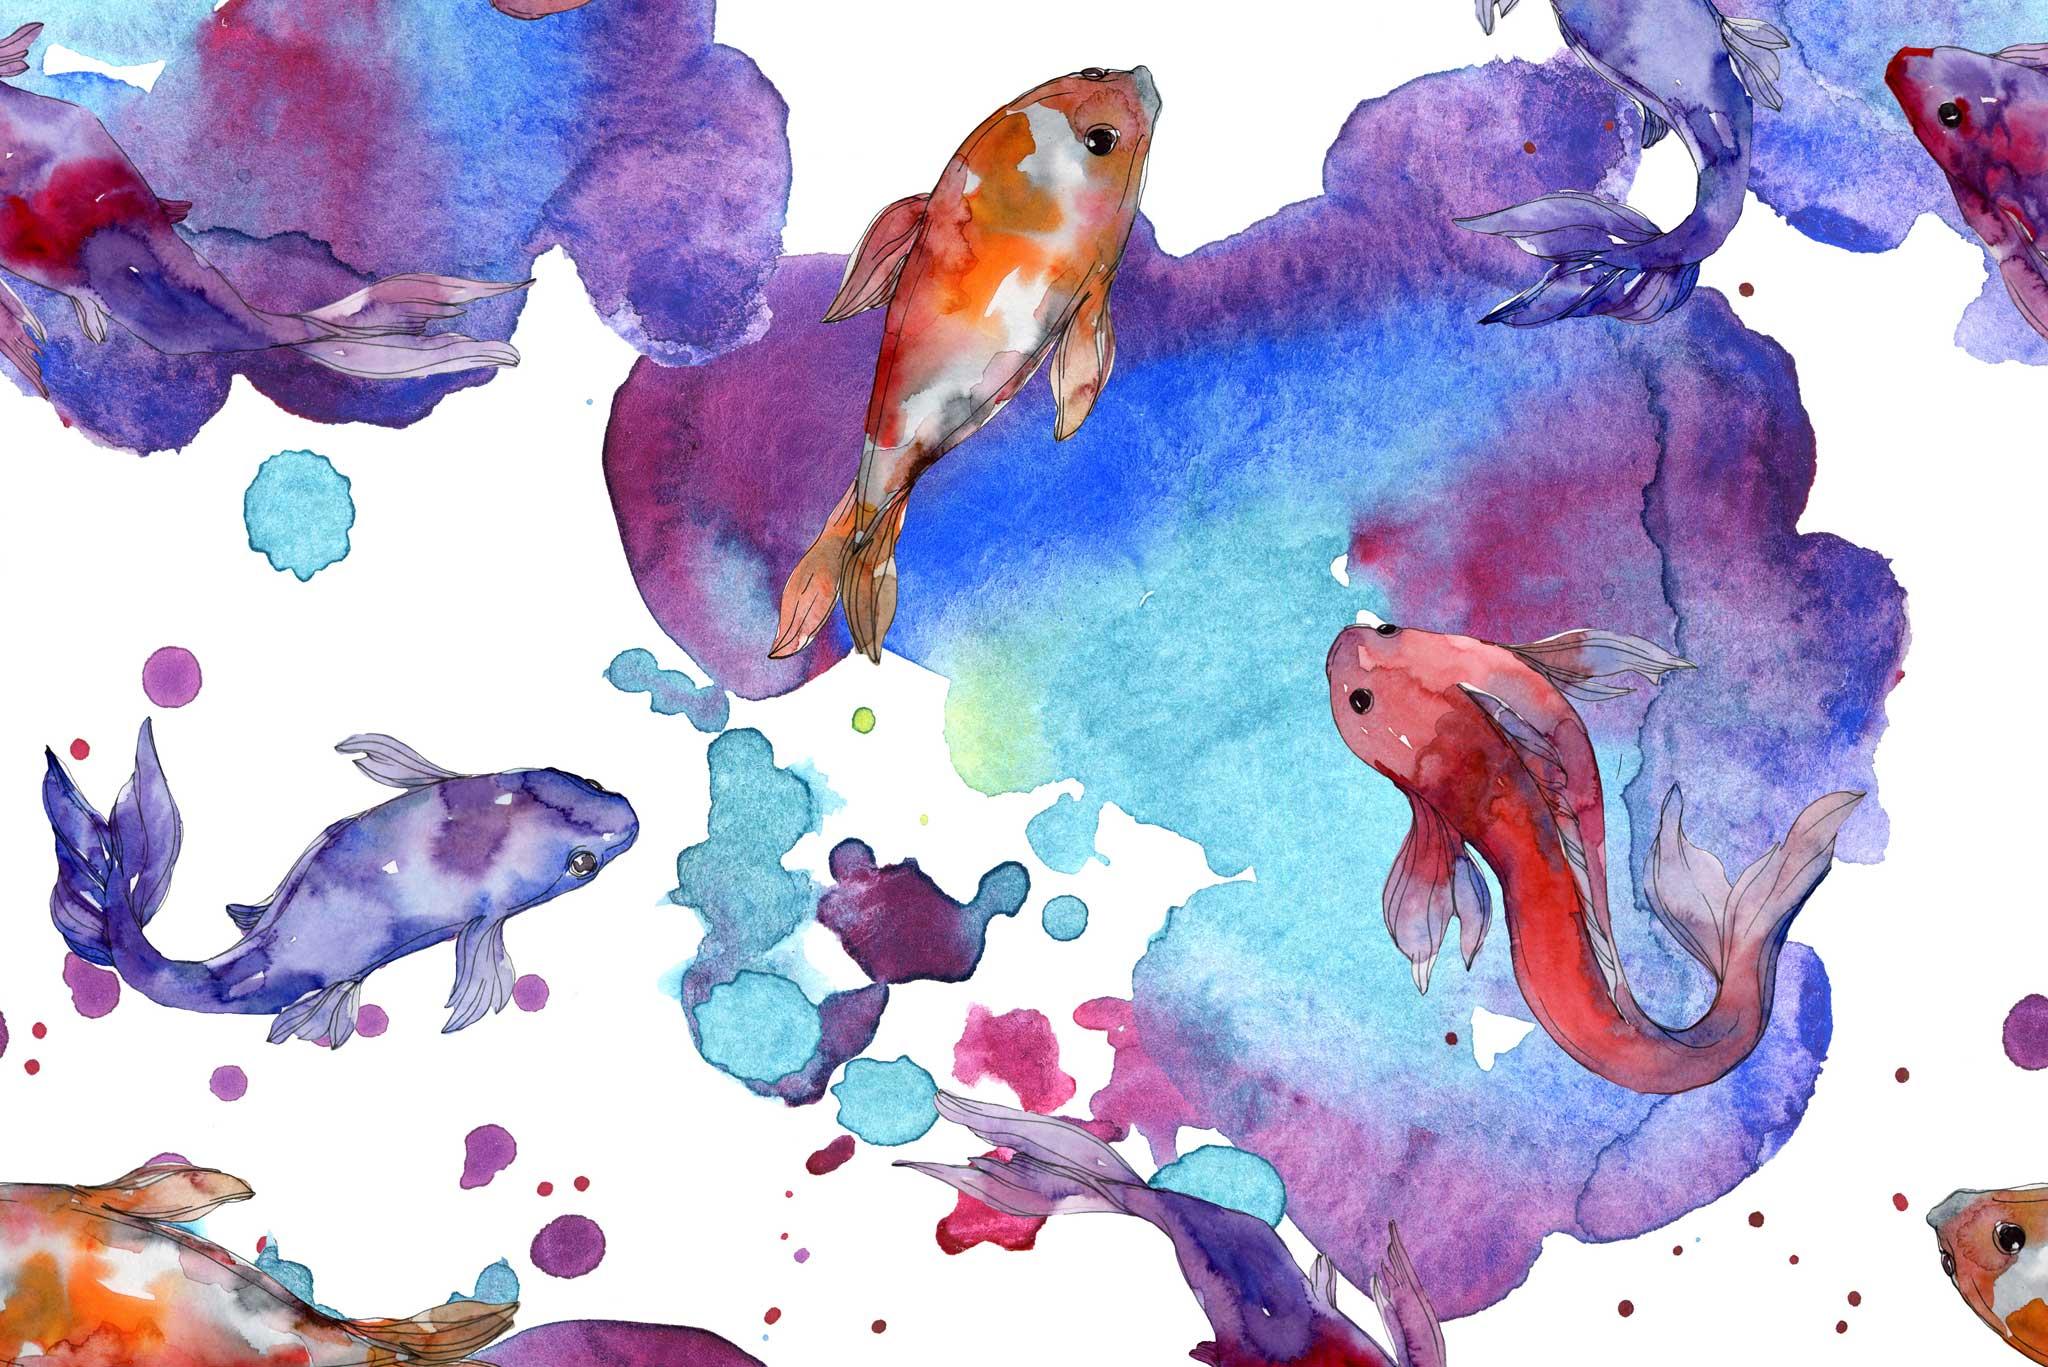 tapet-fototapet-design-decor-mural-customizabil-comanda-personalizat-bucuresti-daring-prints-motiv-model-pesti-koi-desen-acuarela-oranj-mov-albastru-fundal-alb